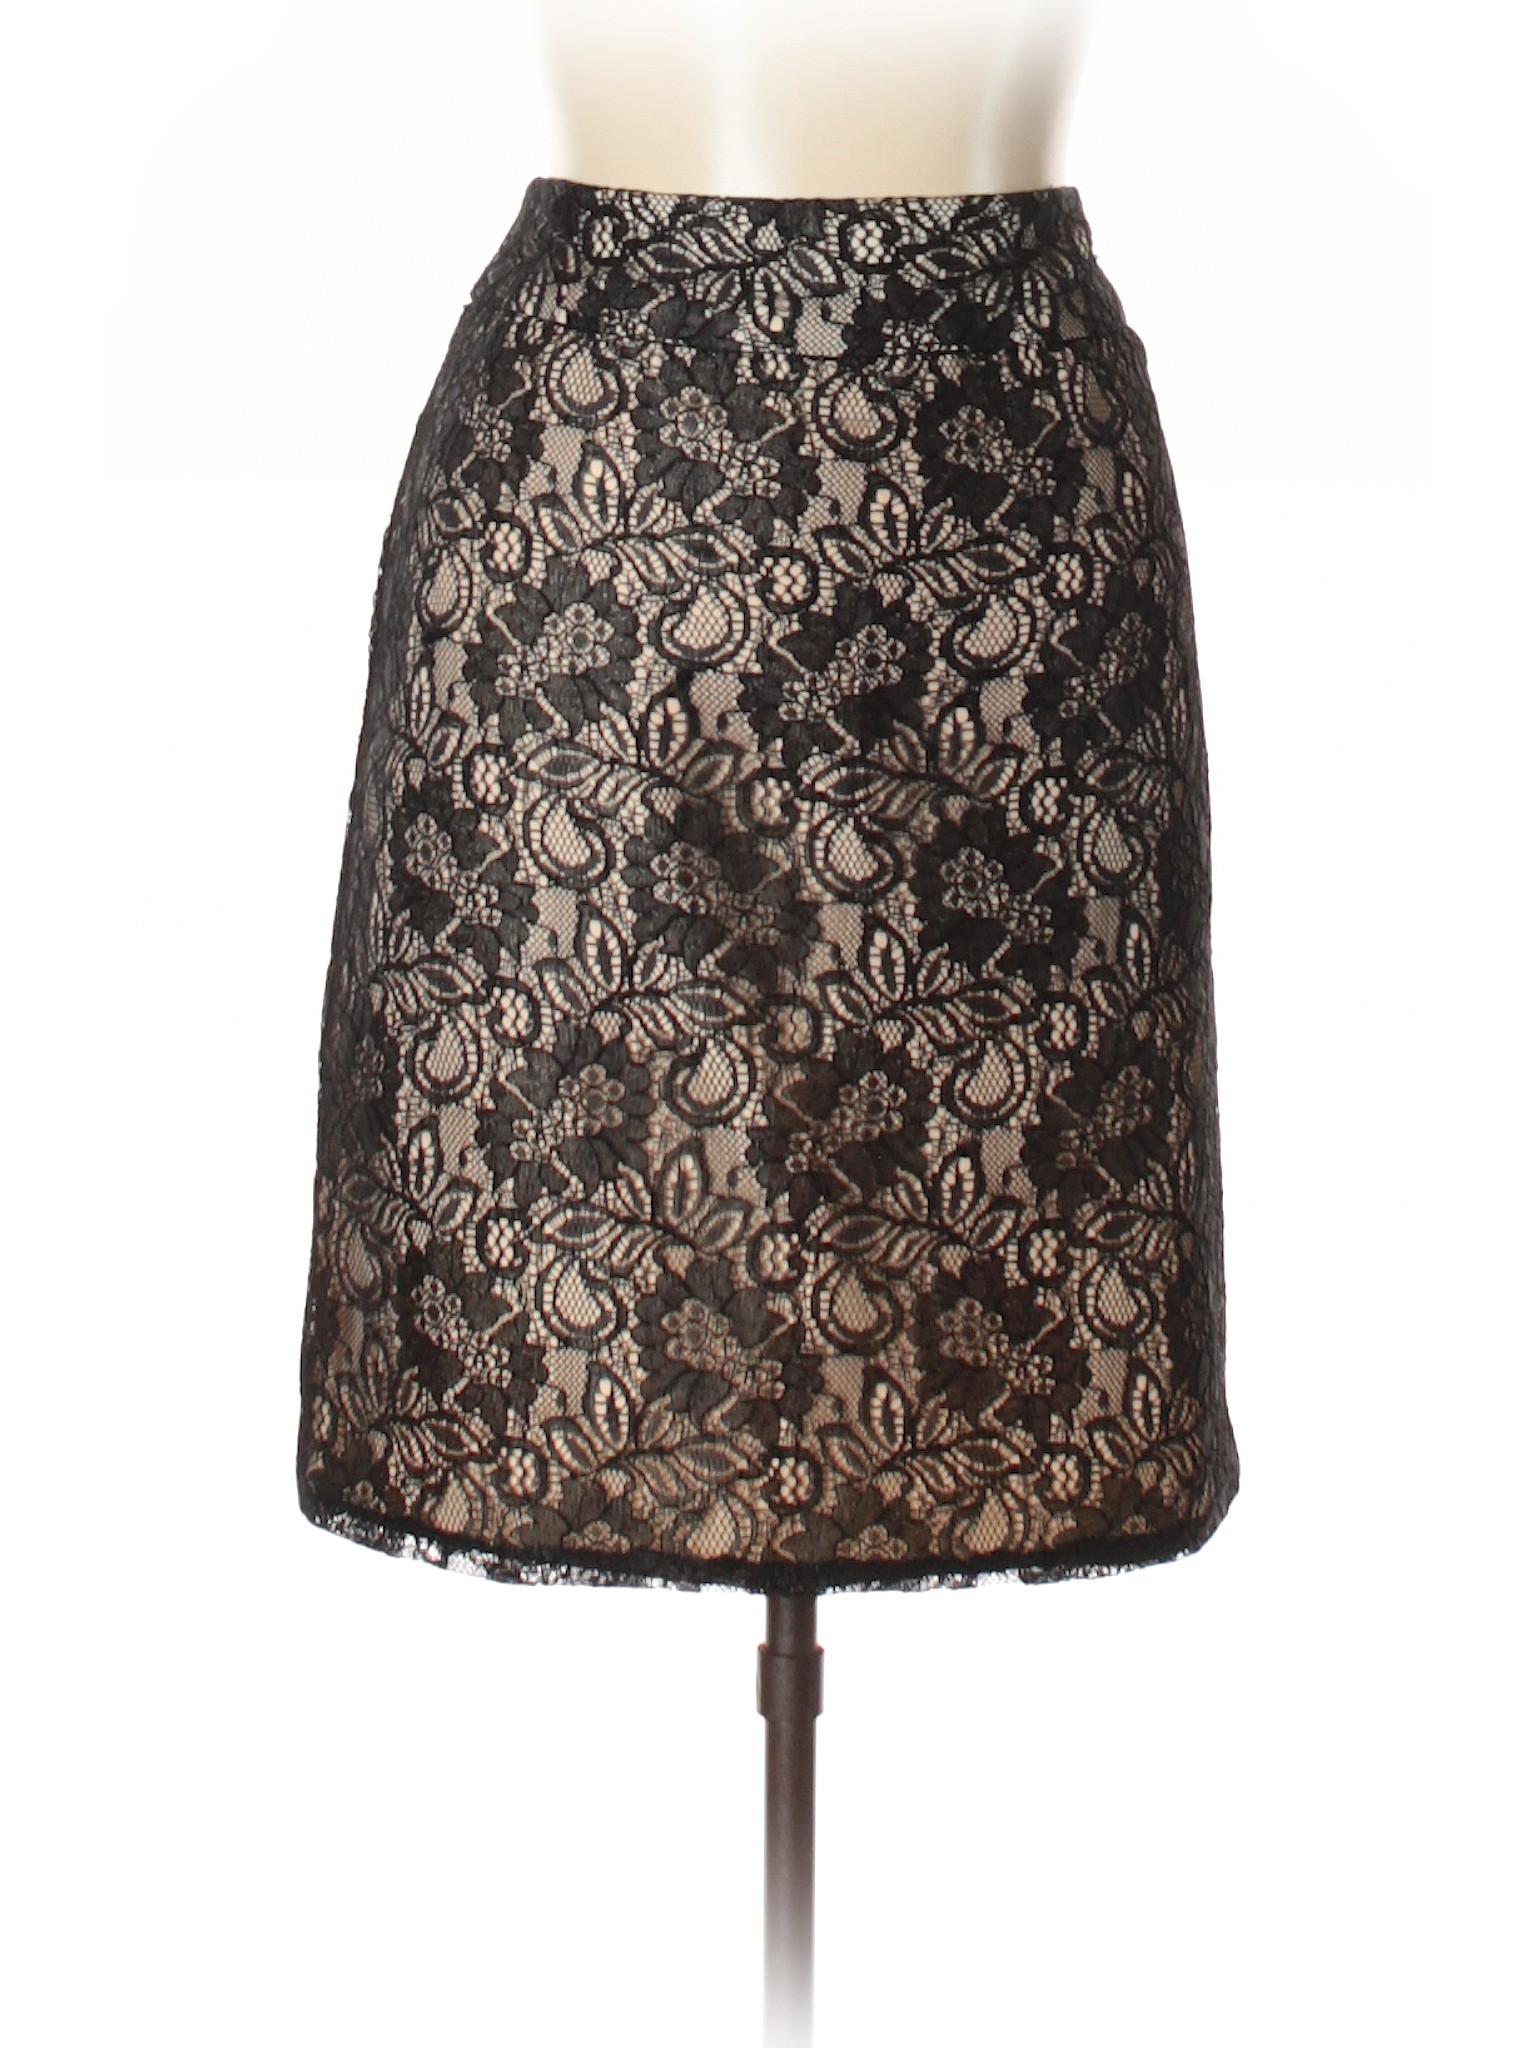 Boutique Casual Skirt York New amp; Company Bg8Brq